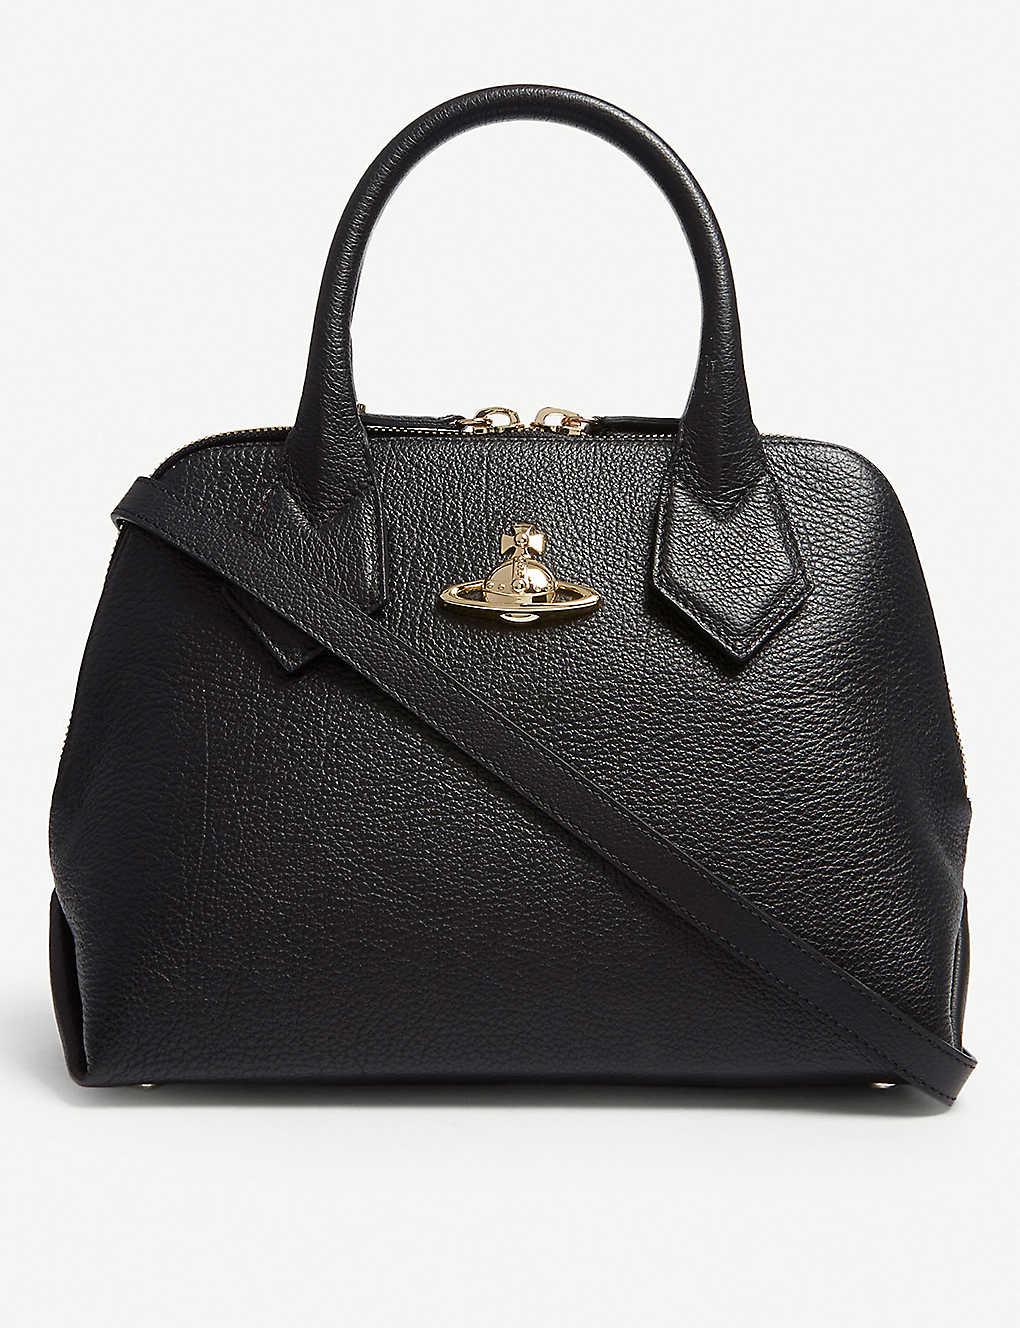 c2e6a4e567 VIVIENNE WESTWOOD - Balmoral small leather shoulder bag | Selfridges.com